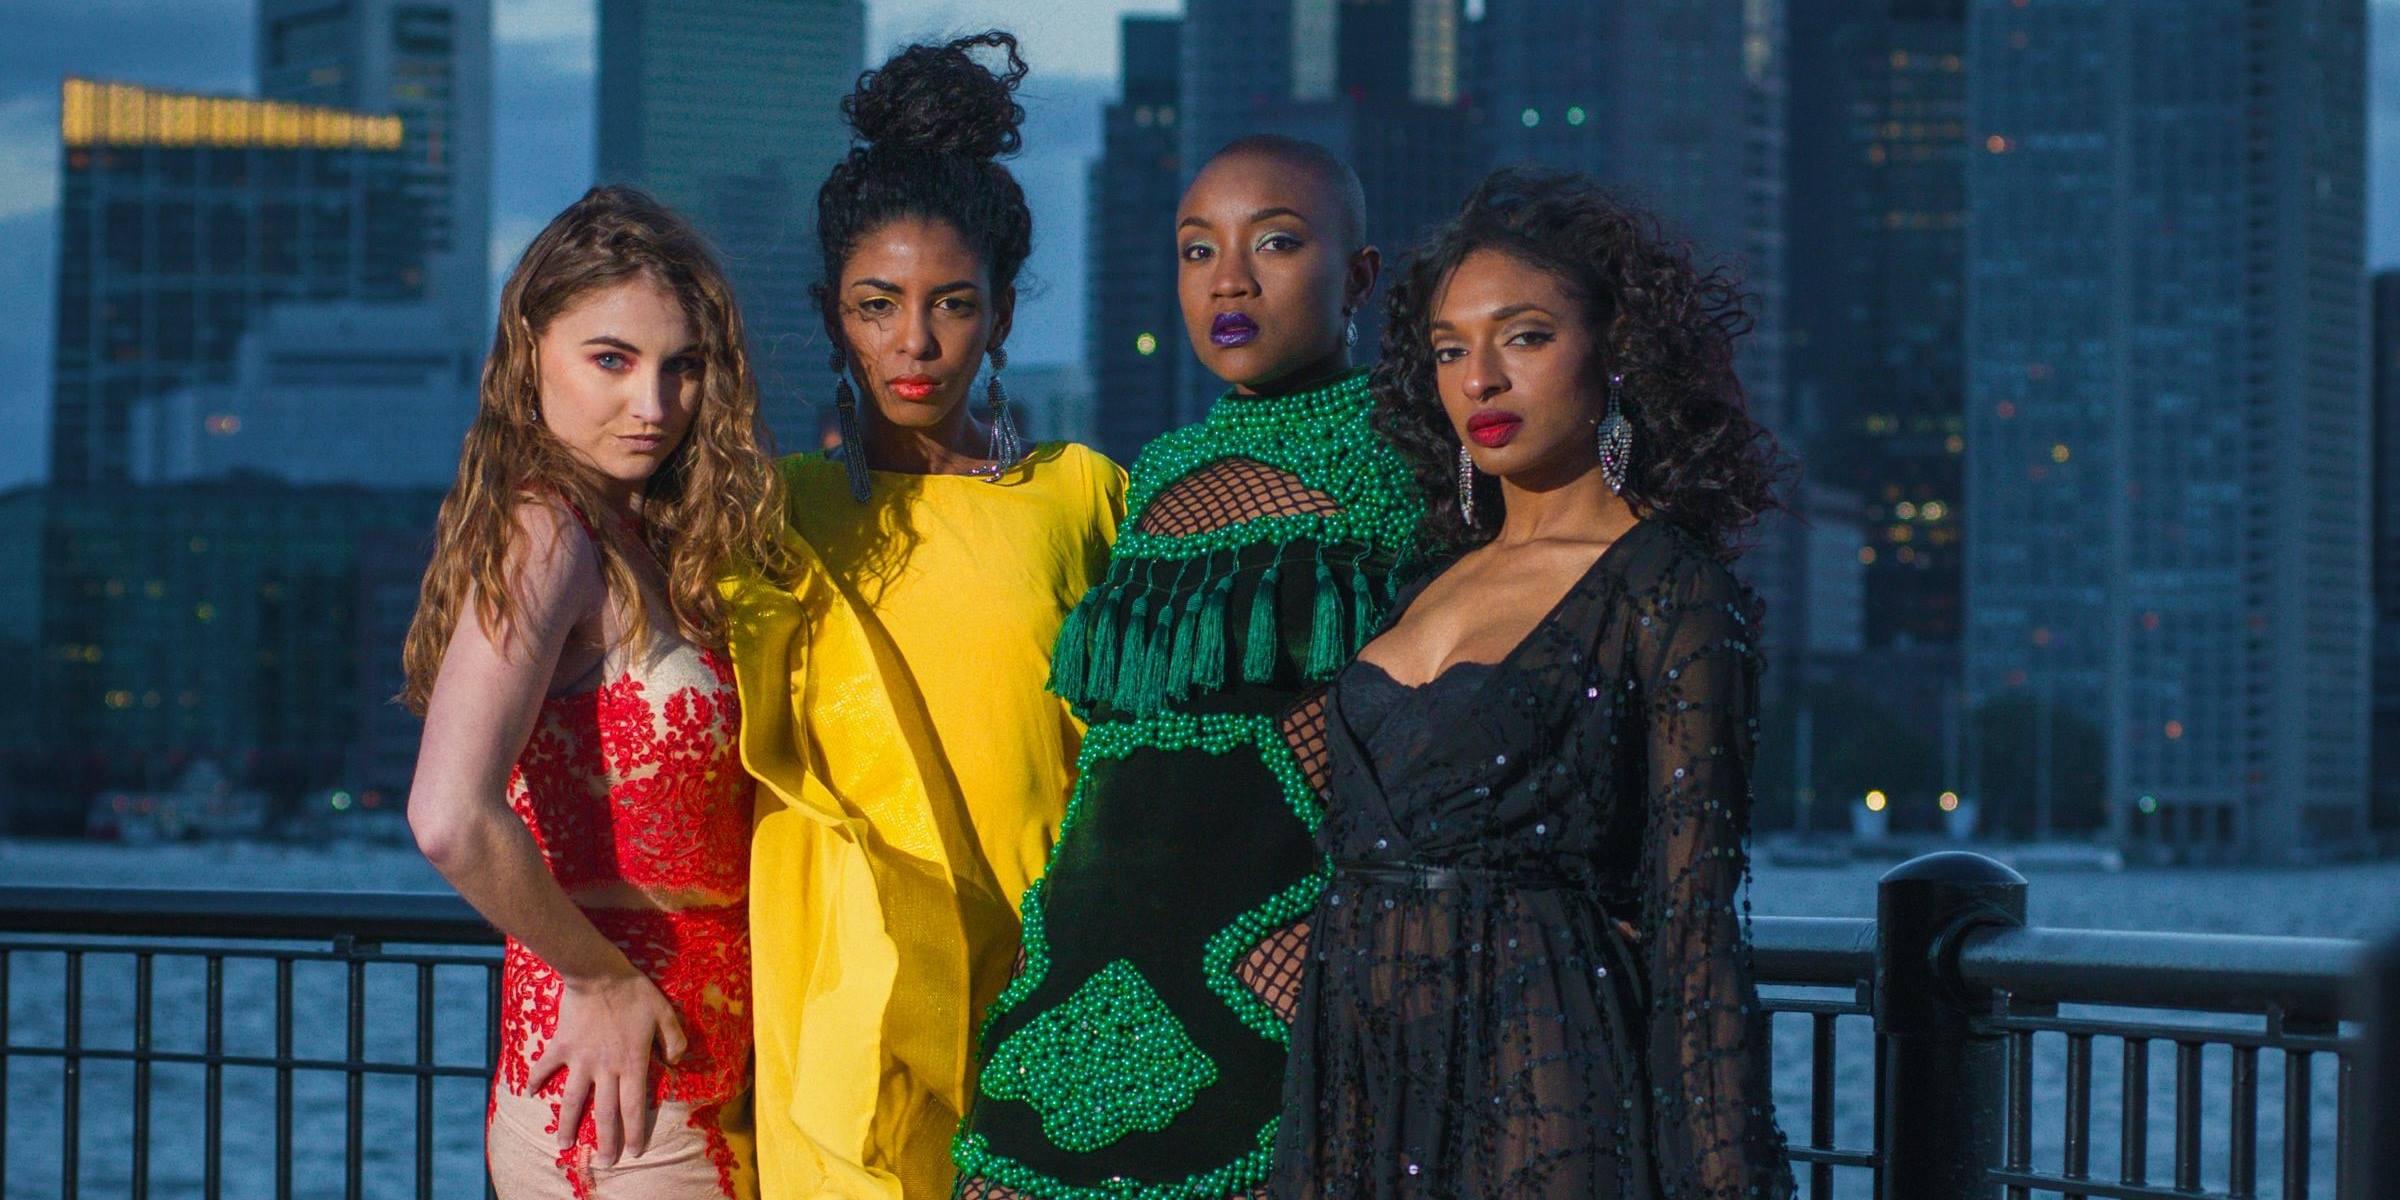 Caribbean Fashion: Boston Caribbean Fashion Week 2017 Runway Show [08/12/17]